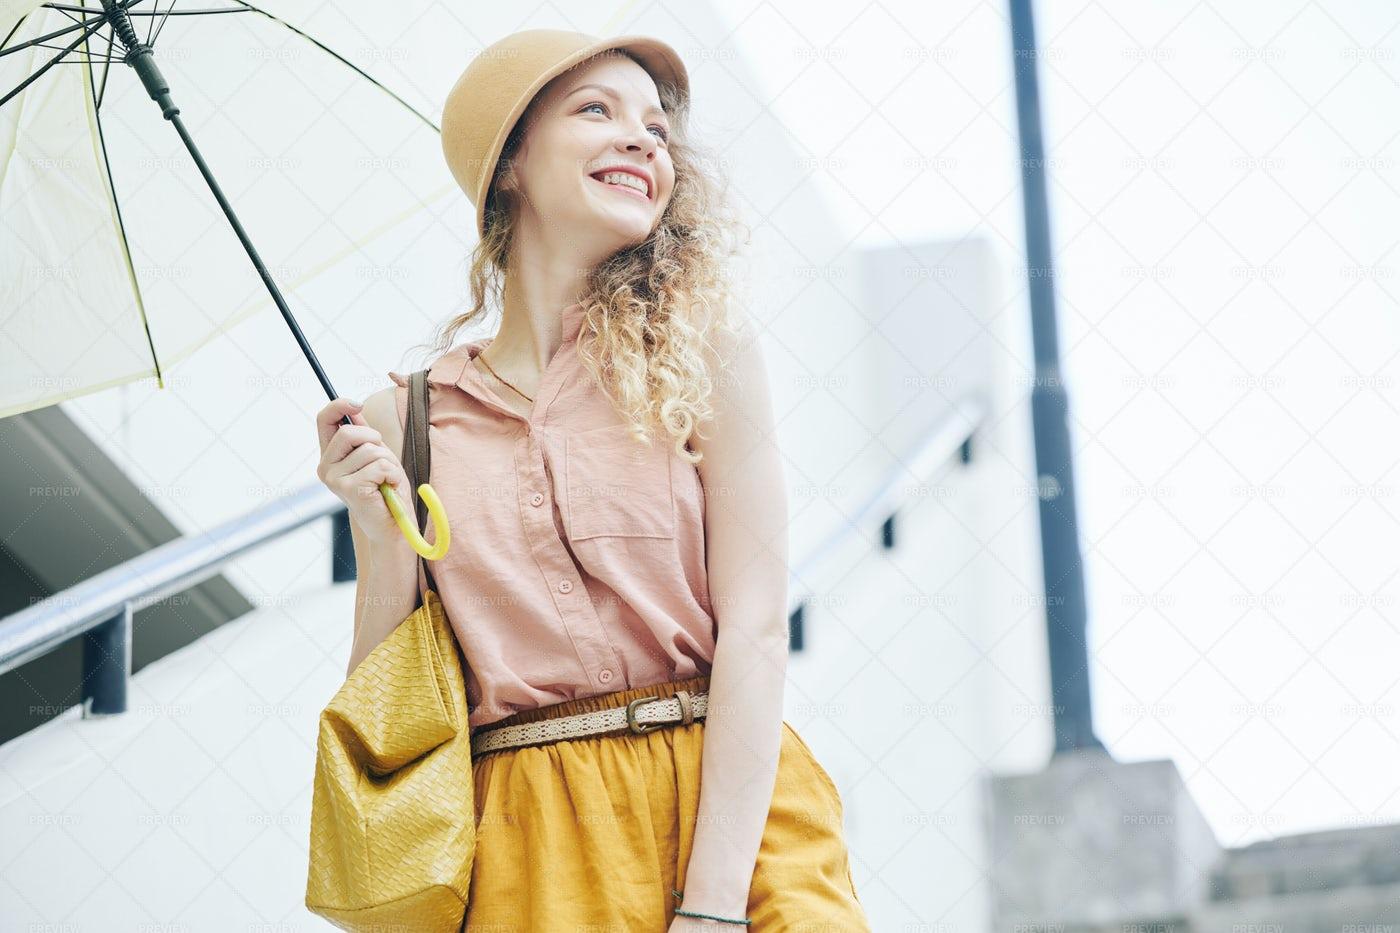 Woman Enjoying Rainy Day: Stock Photos